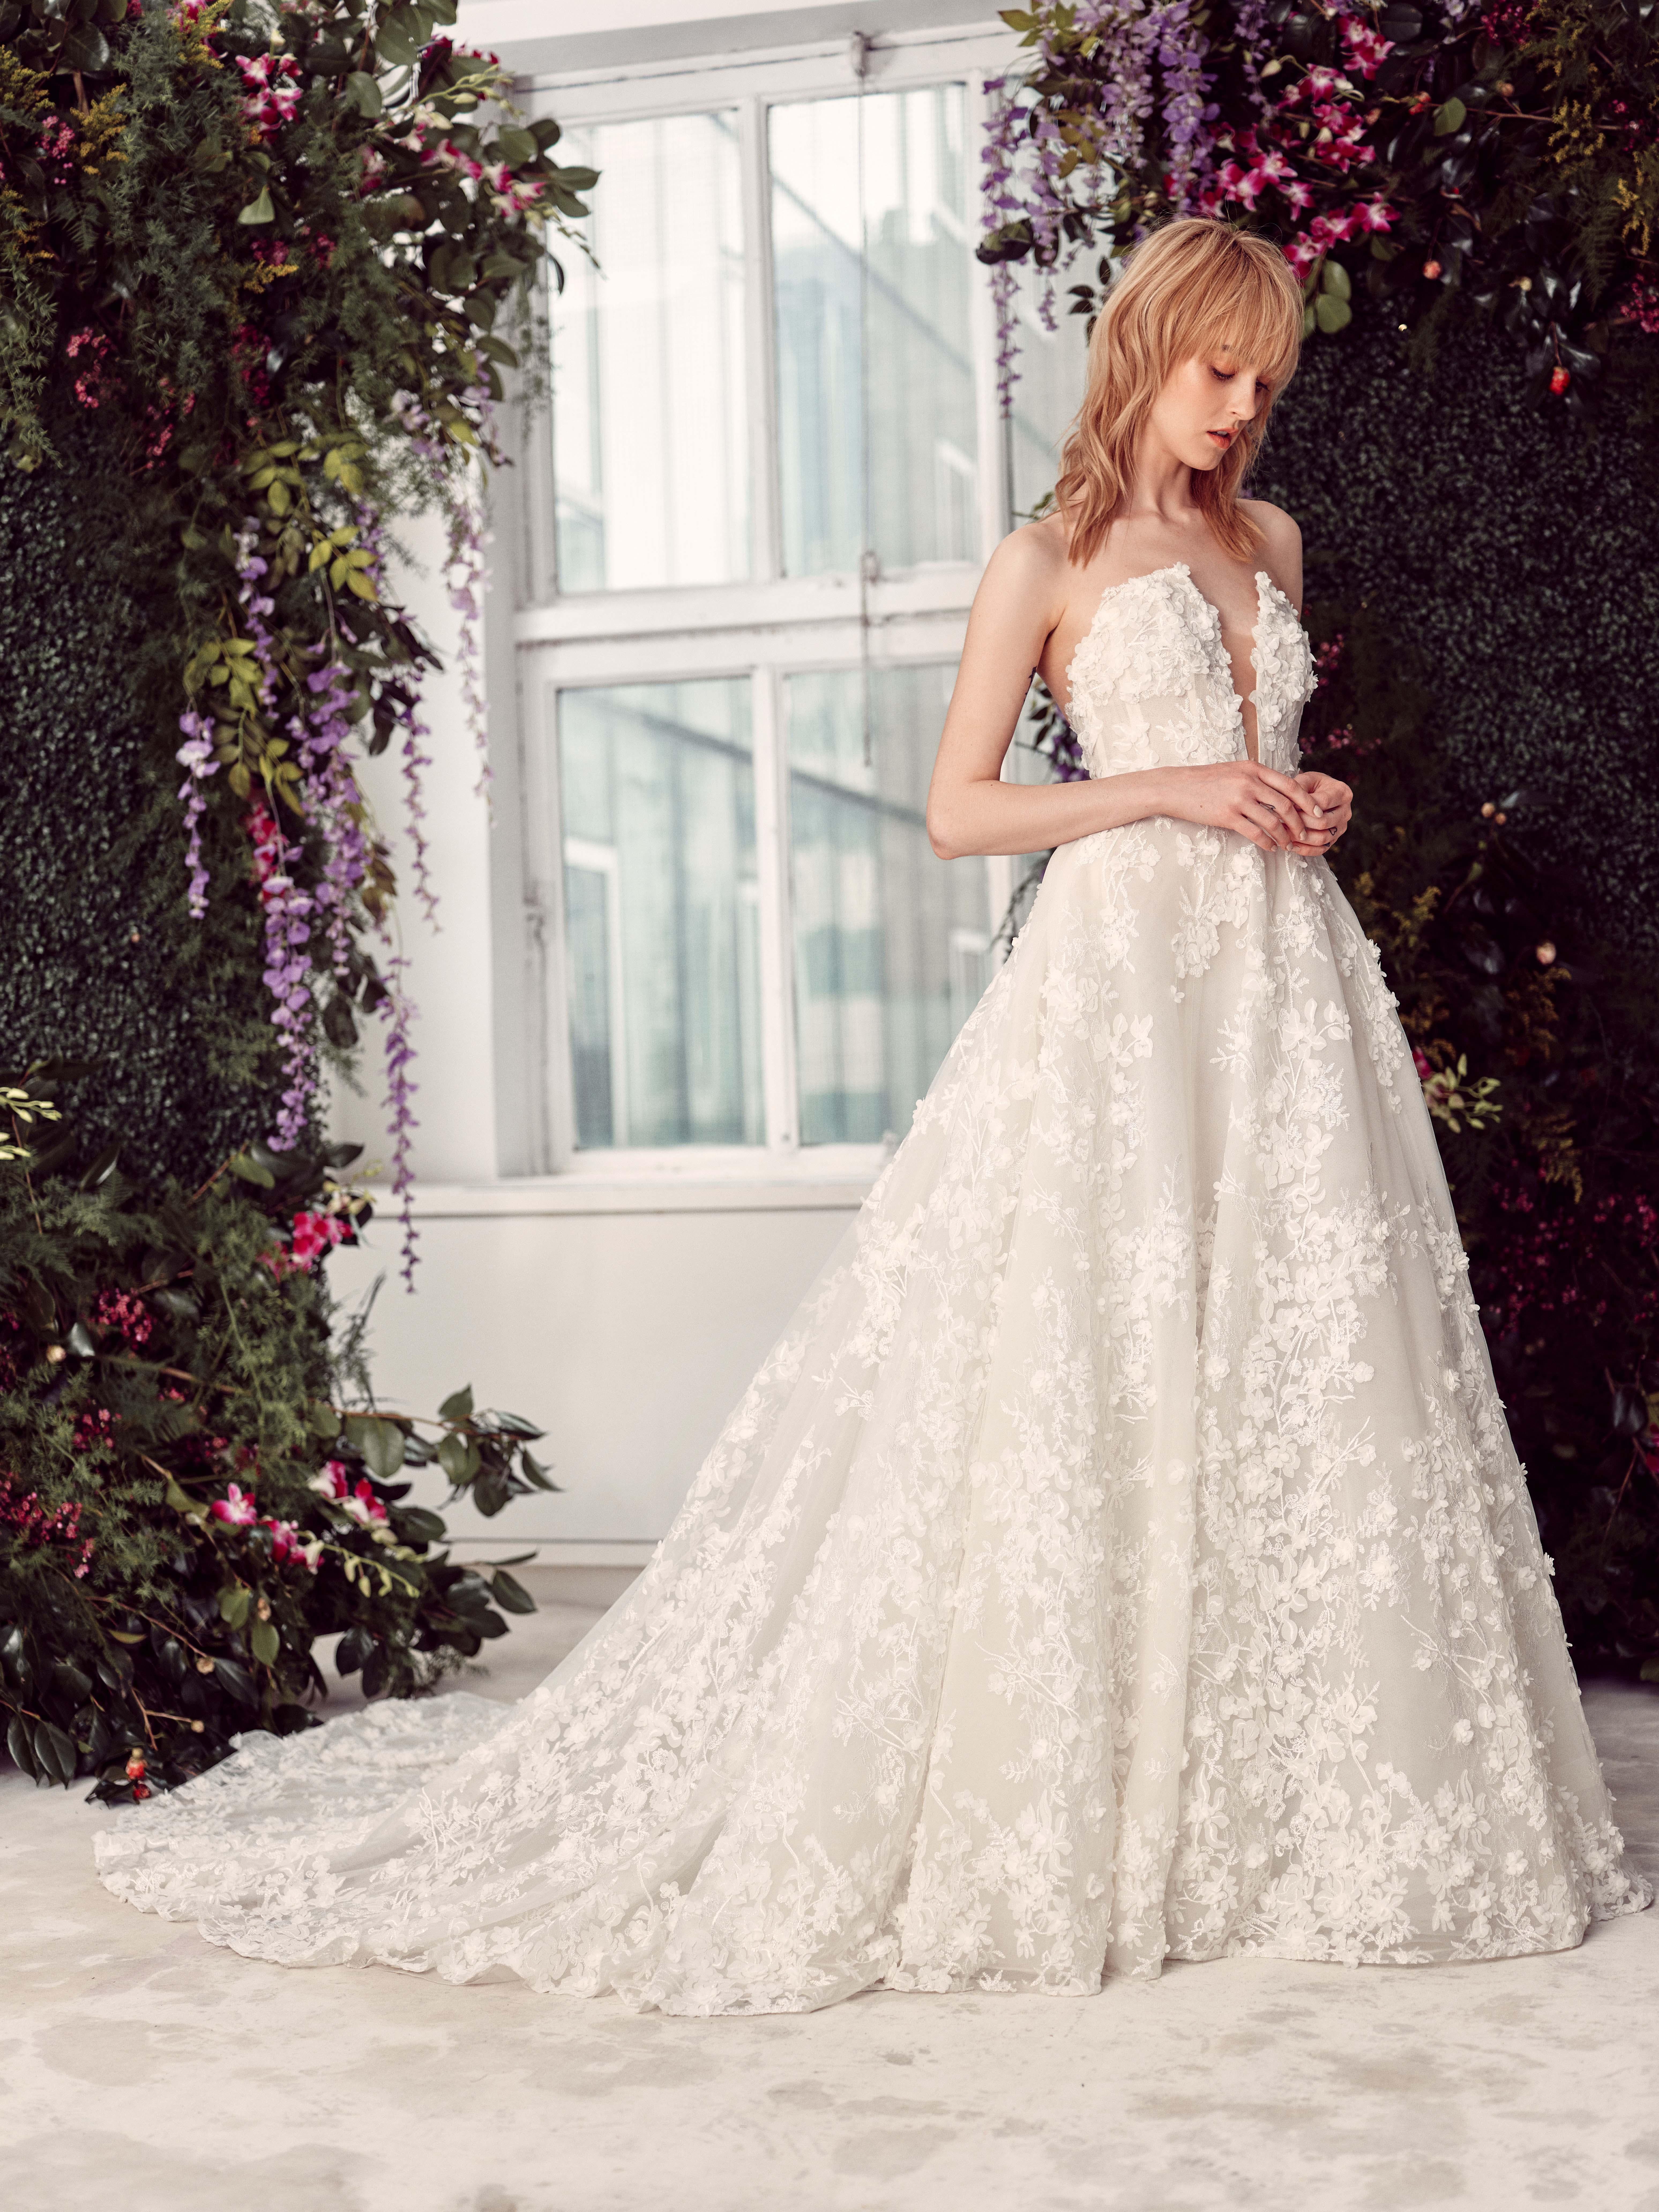 strapless plunging v-neck floral applique a-line wedding dress Rivini by Rita Vinieris Spring 2020